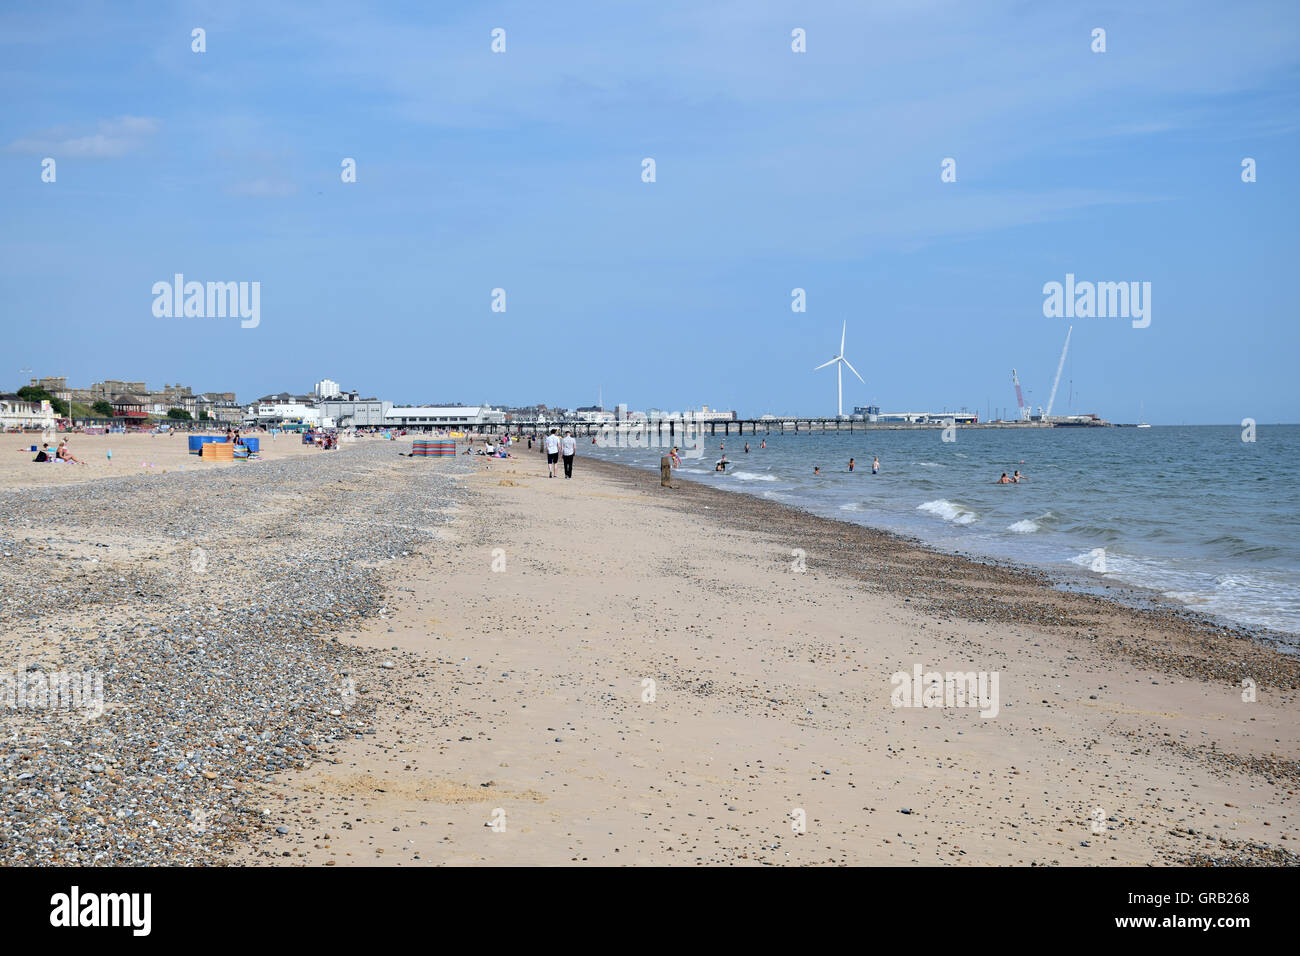 Lowestoft beach, Suffolk, Aug 2016 - Stock Image